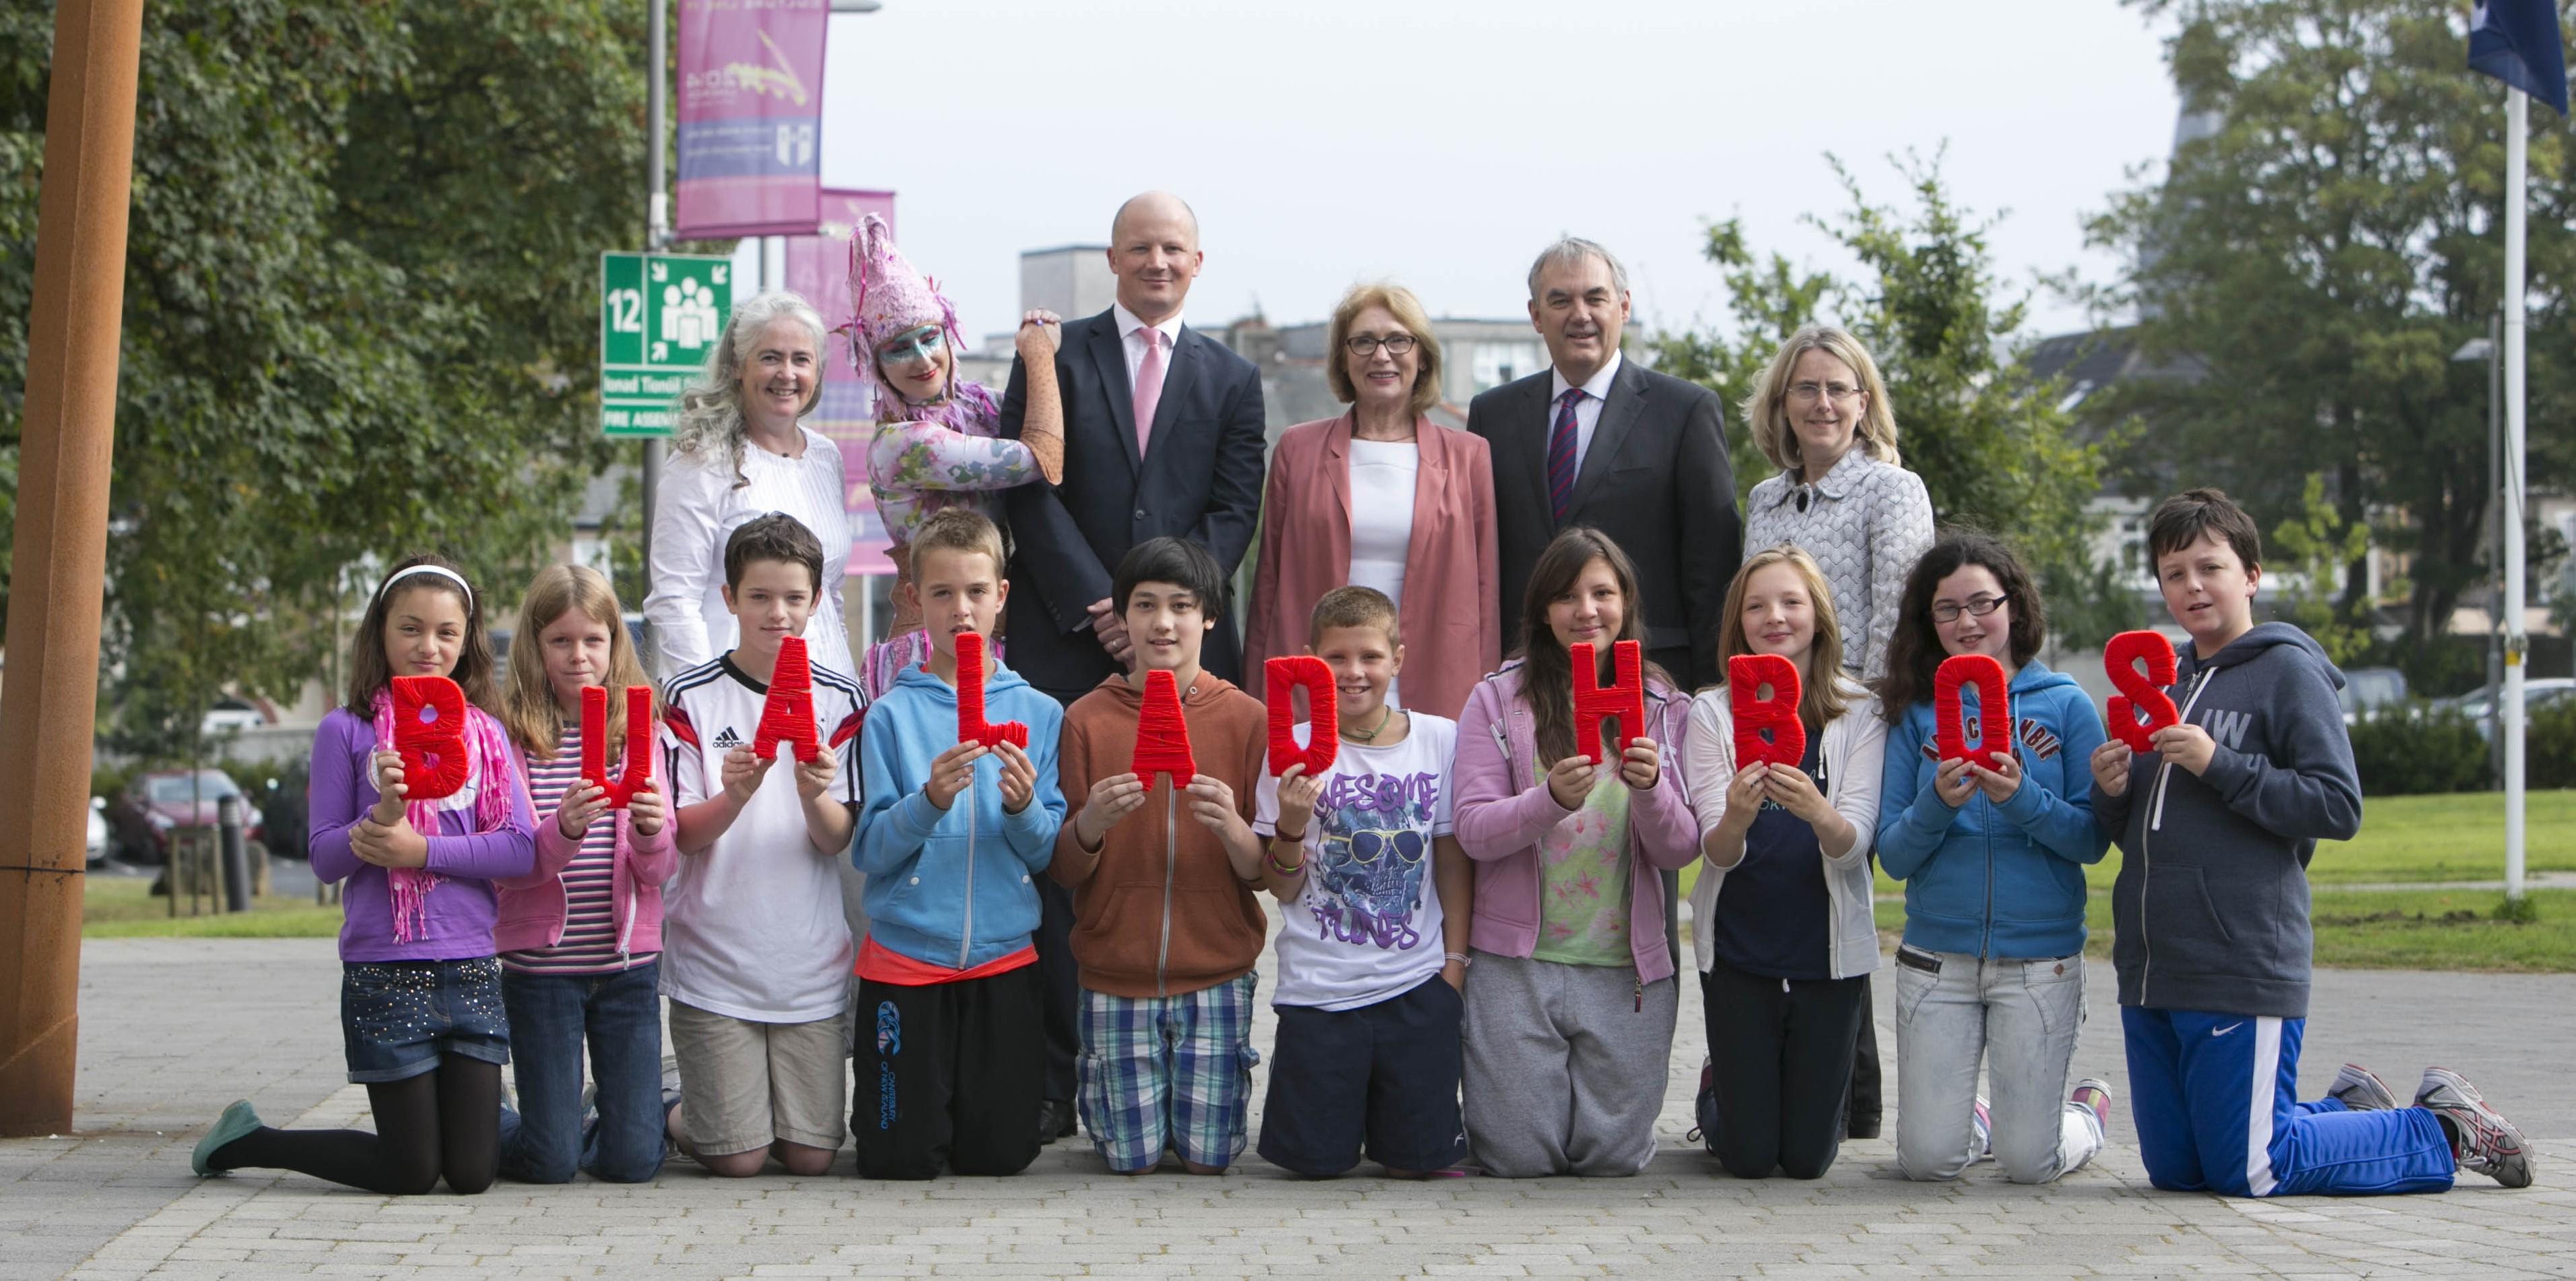 Bualadh Bos Childrens Festival